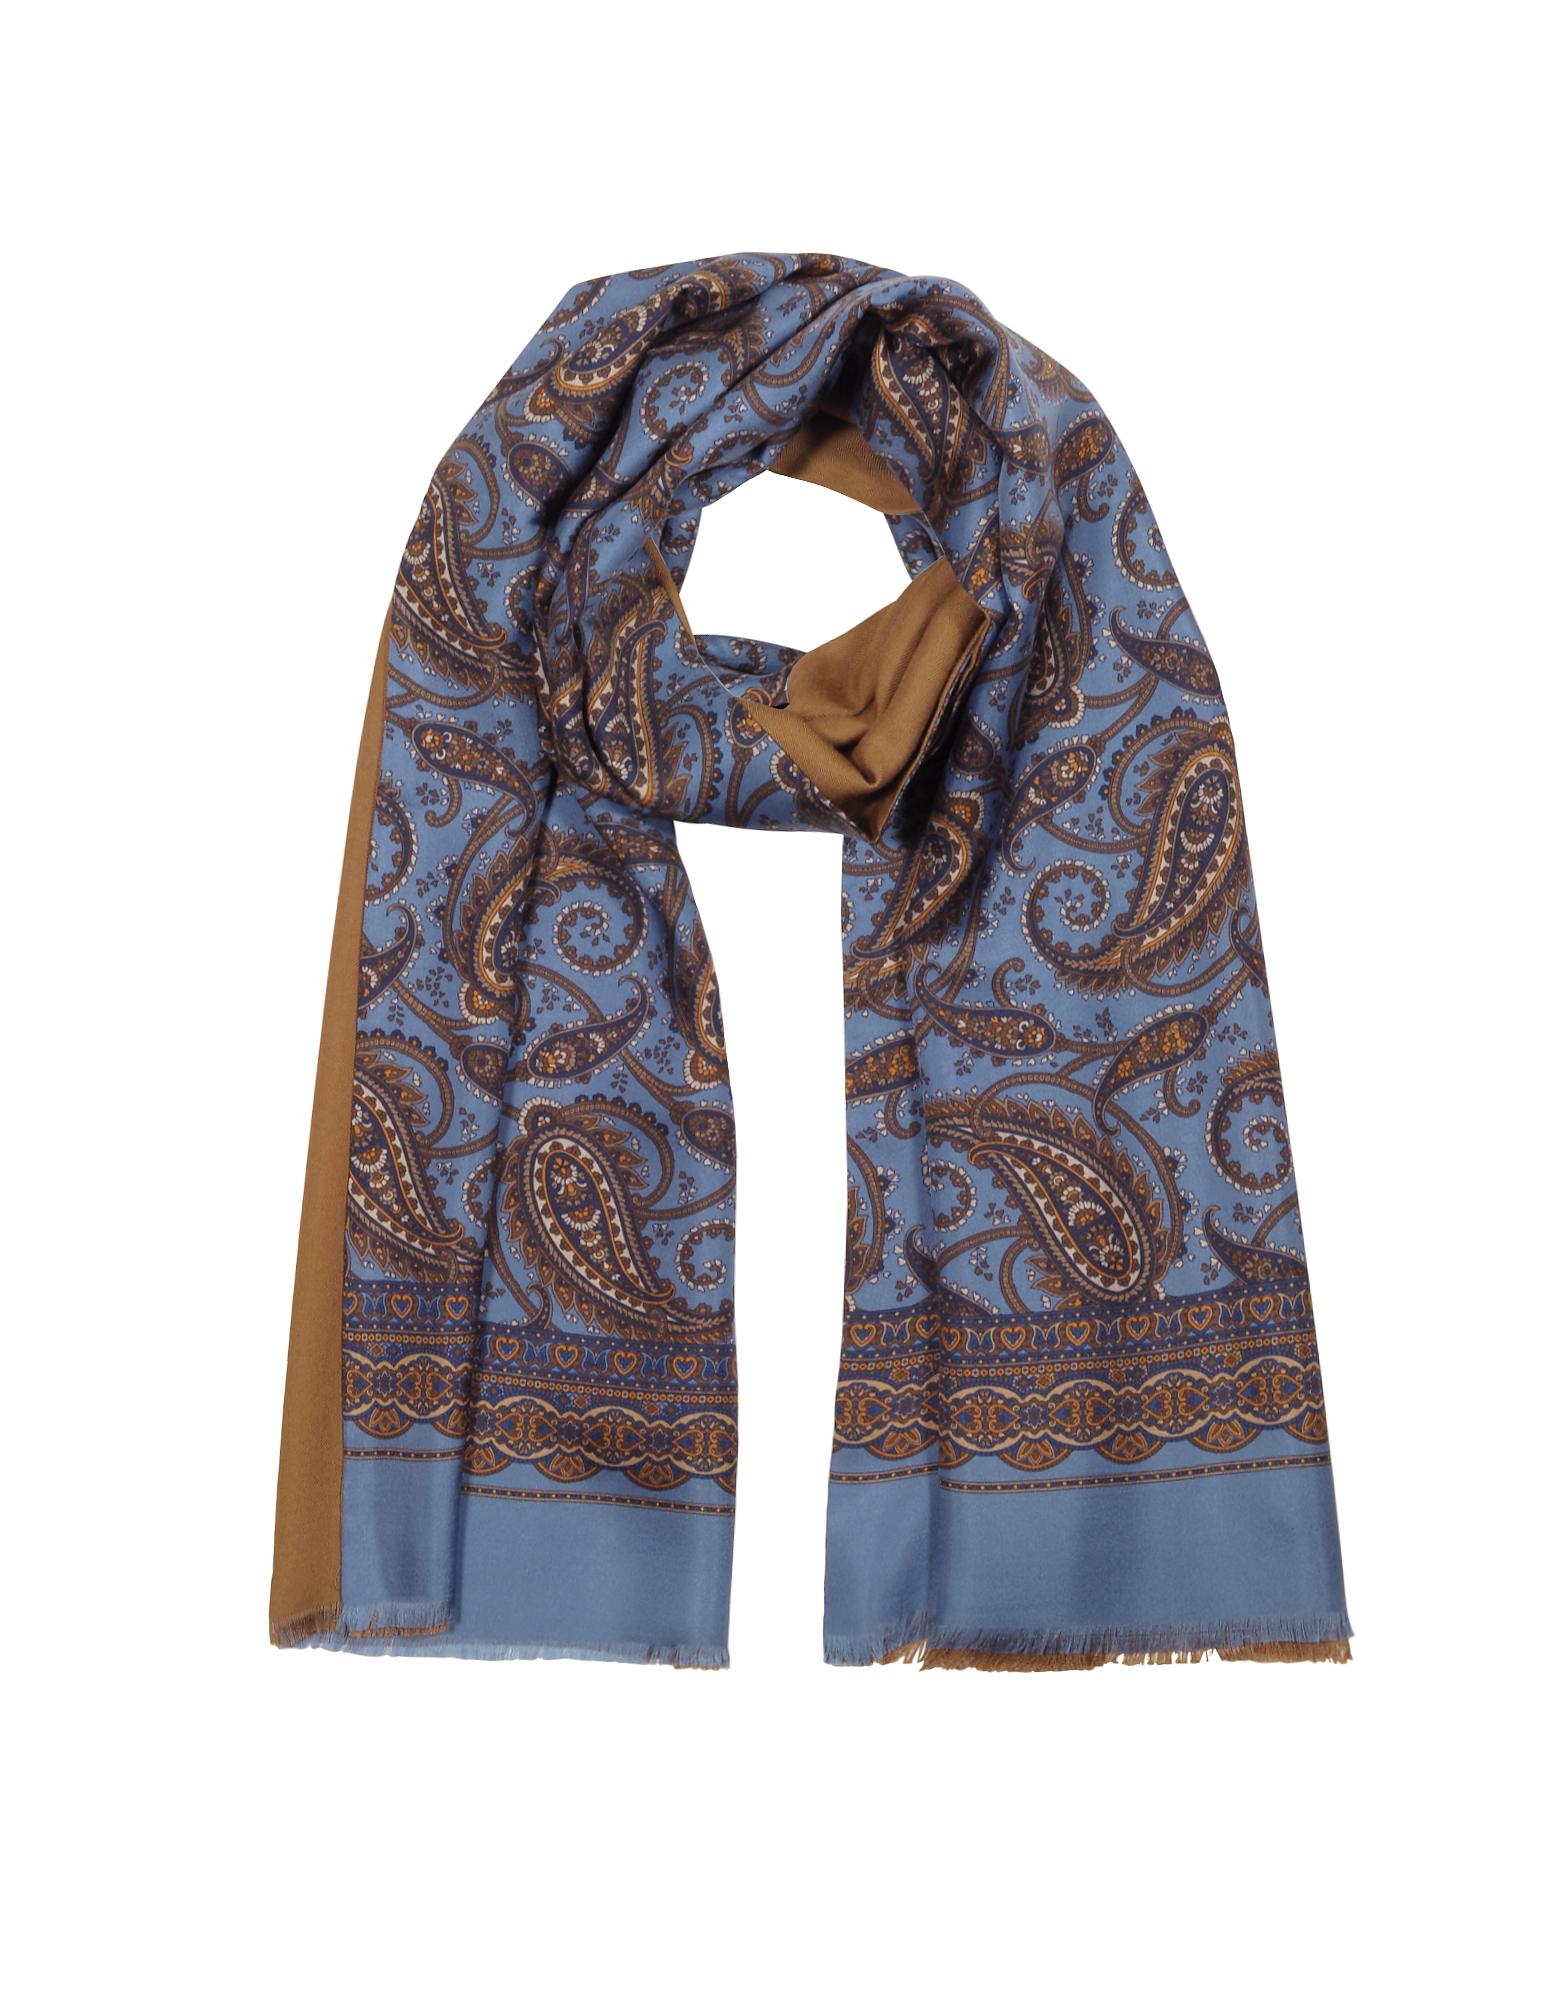 Modal & Silk Oversized Paisley Print Men's Fringed Scarf